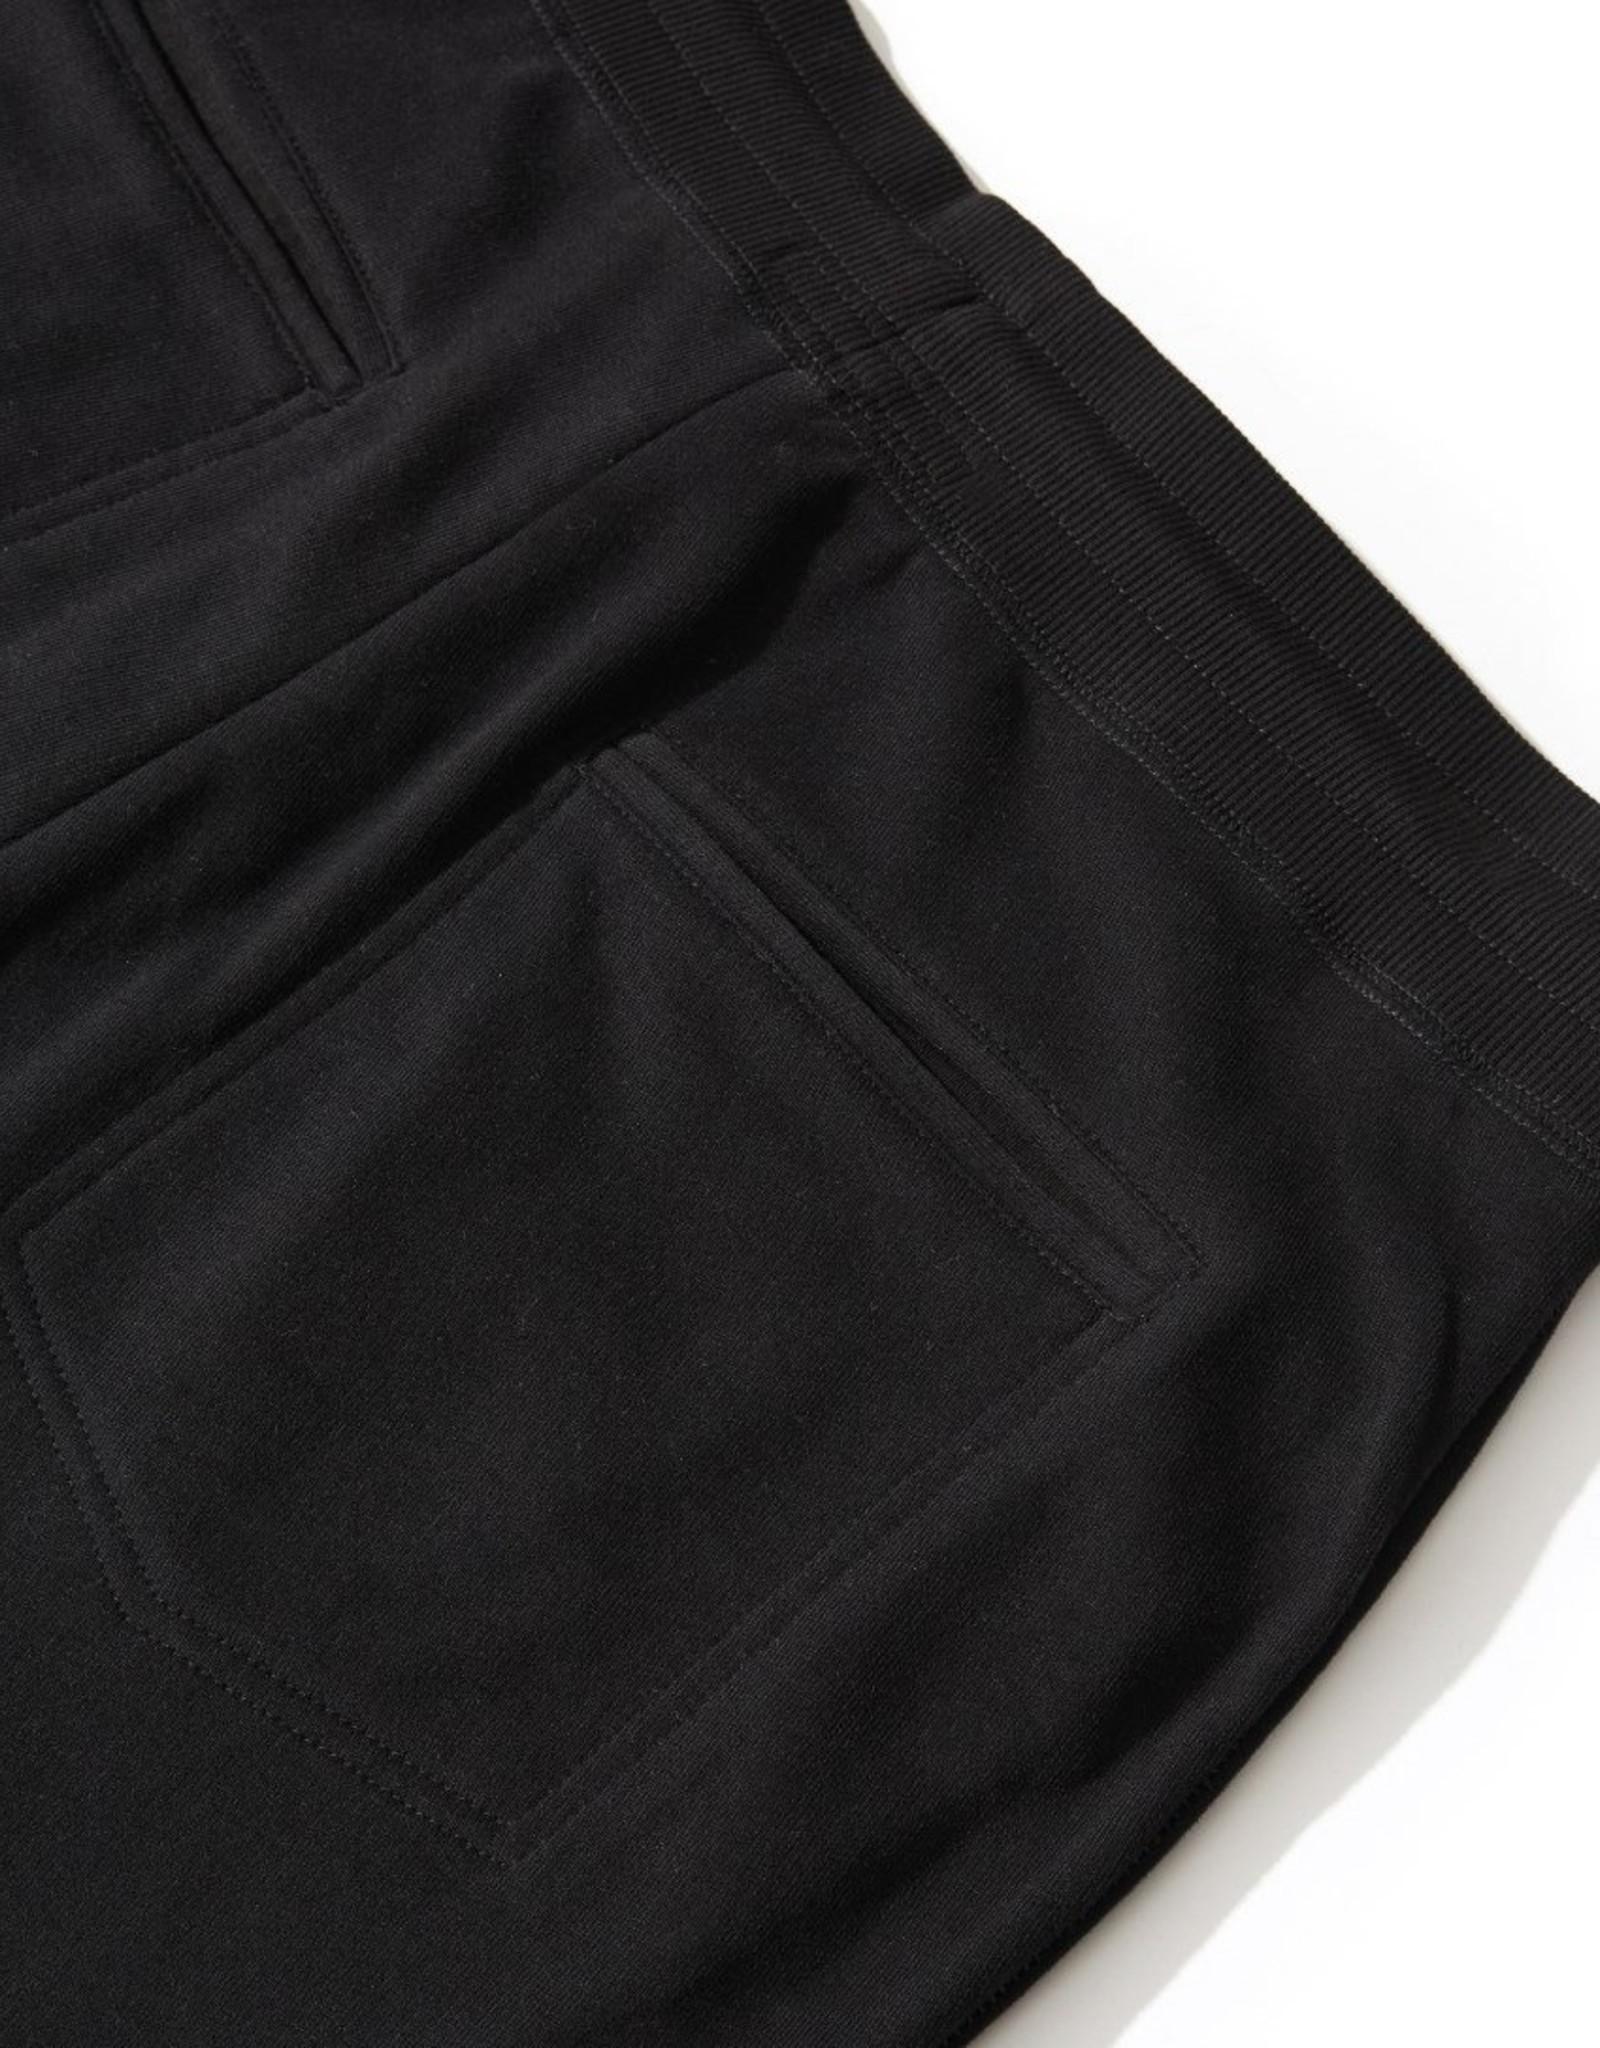 Robert Barakett Robert Barakett Lounge Pants